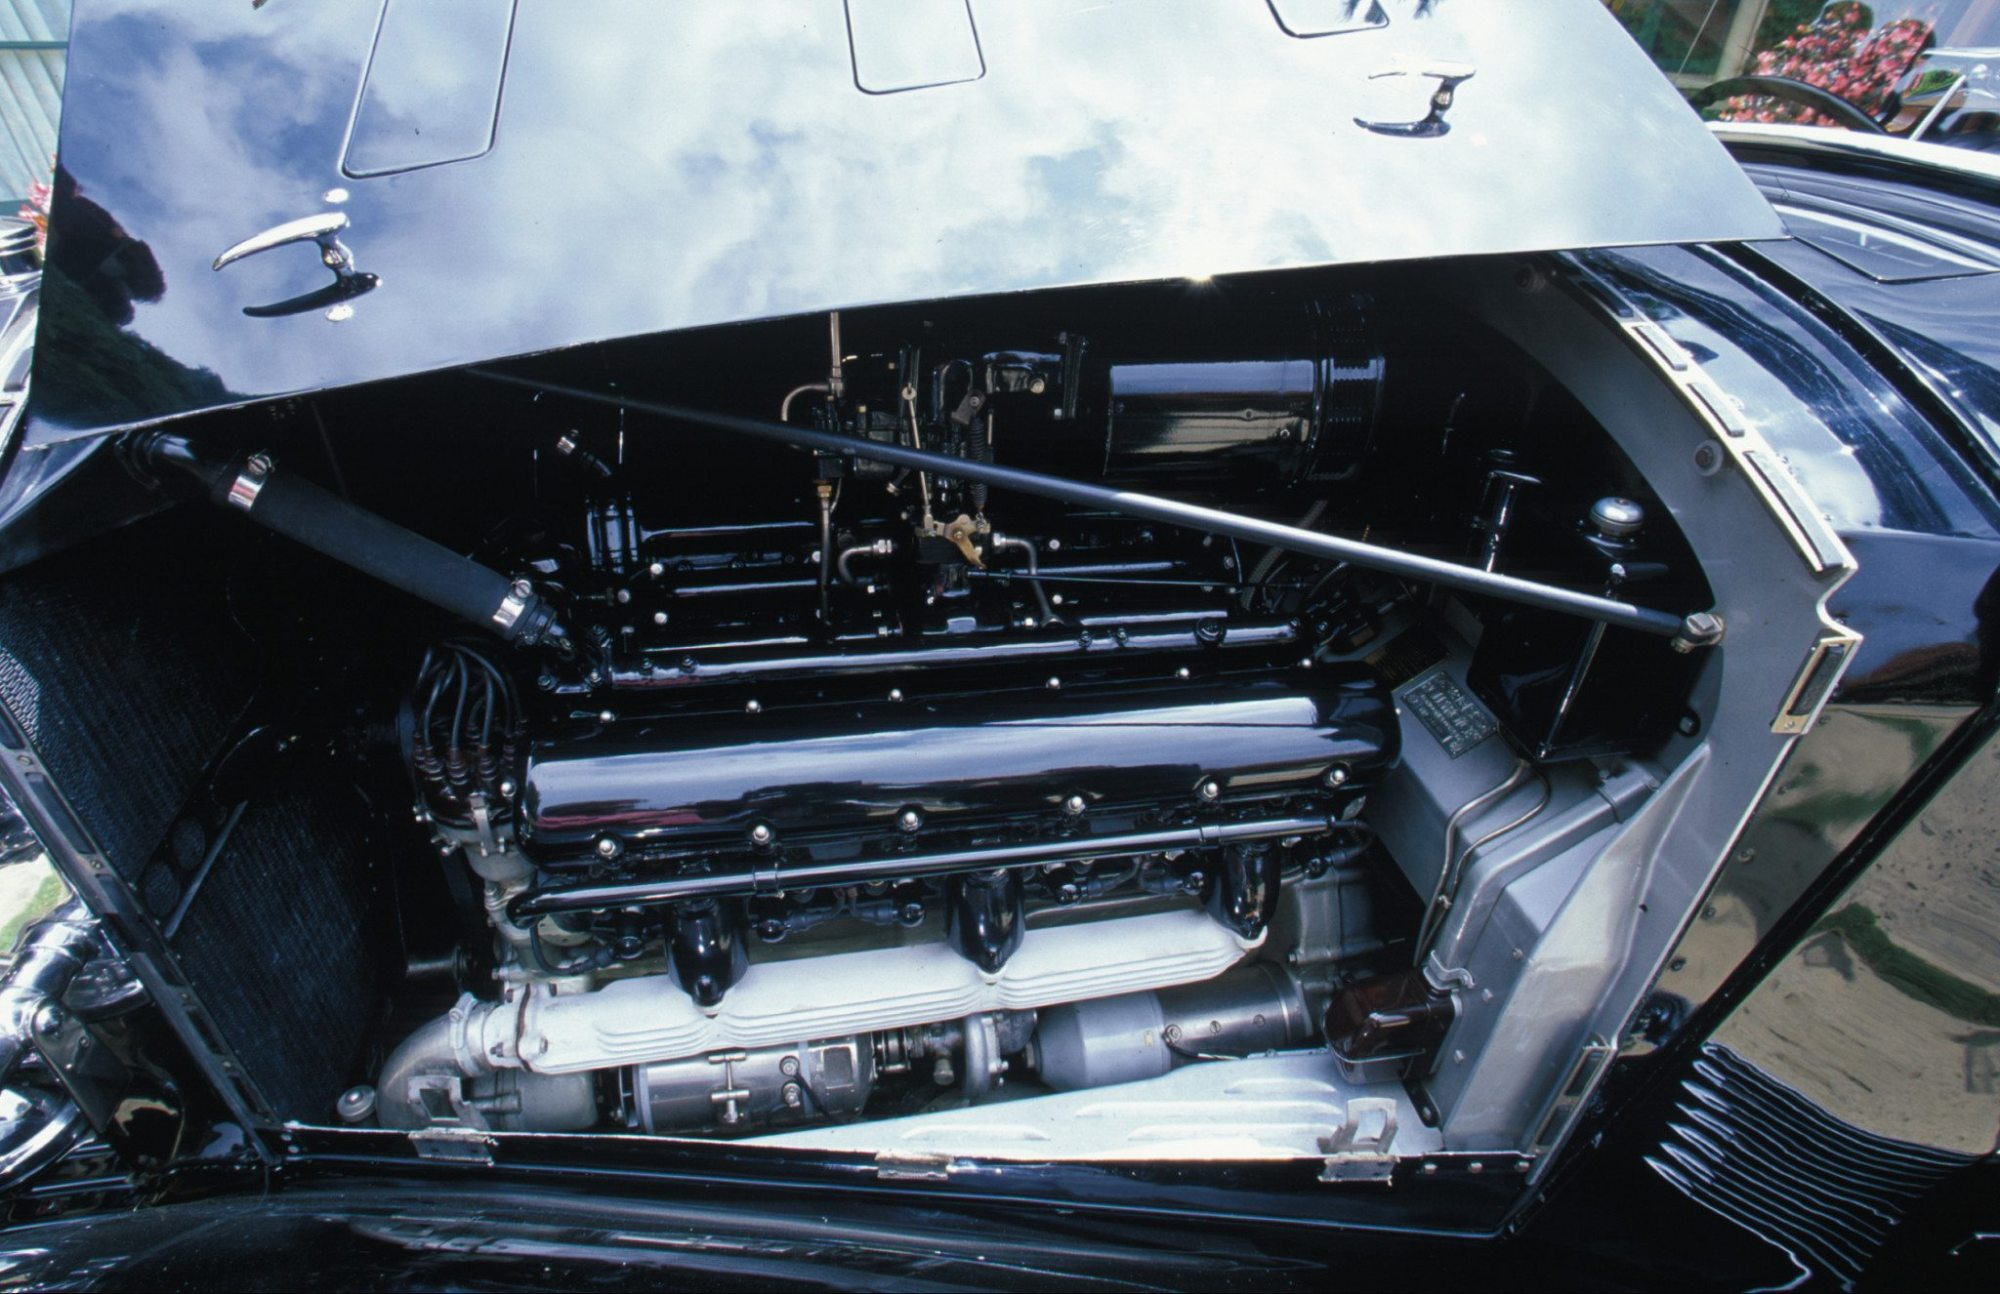 hight resolution of 1937 rolls royce brewster bodied sedanca de ville v12 engine